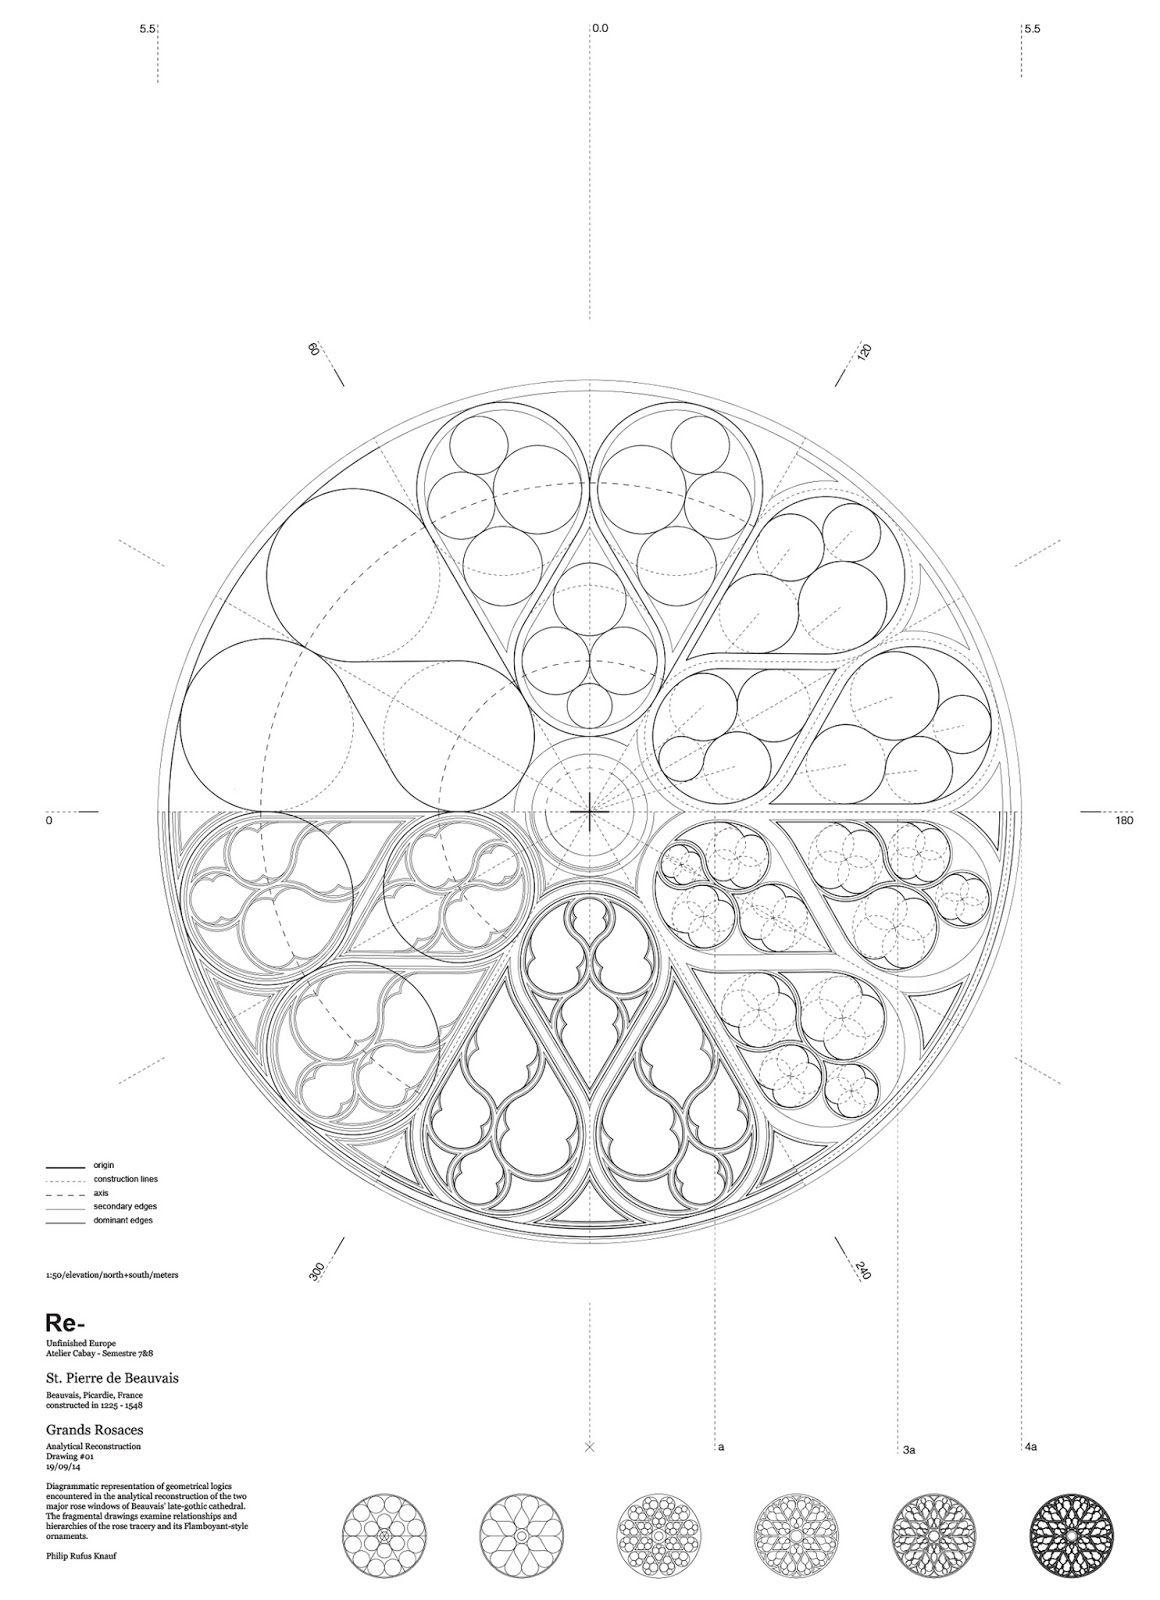 Pin by Wazir Rohiman on Parametric Design in 2019